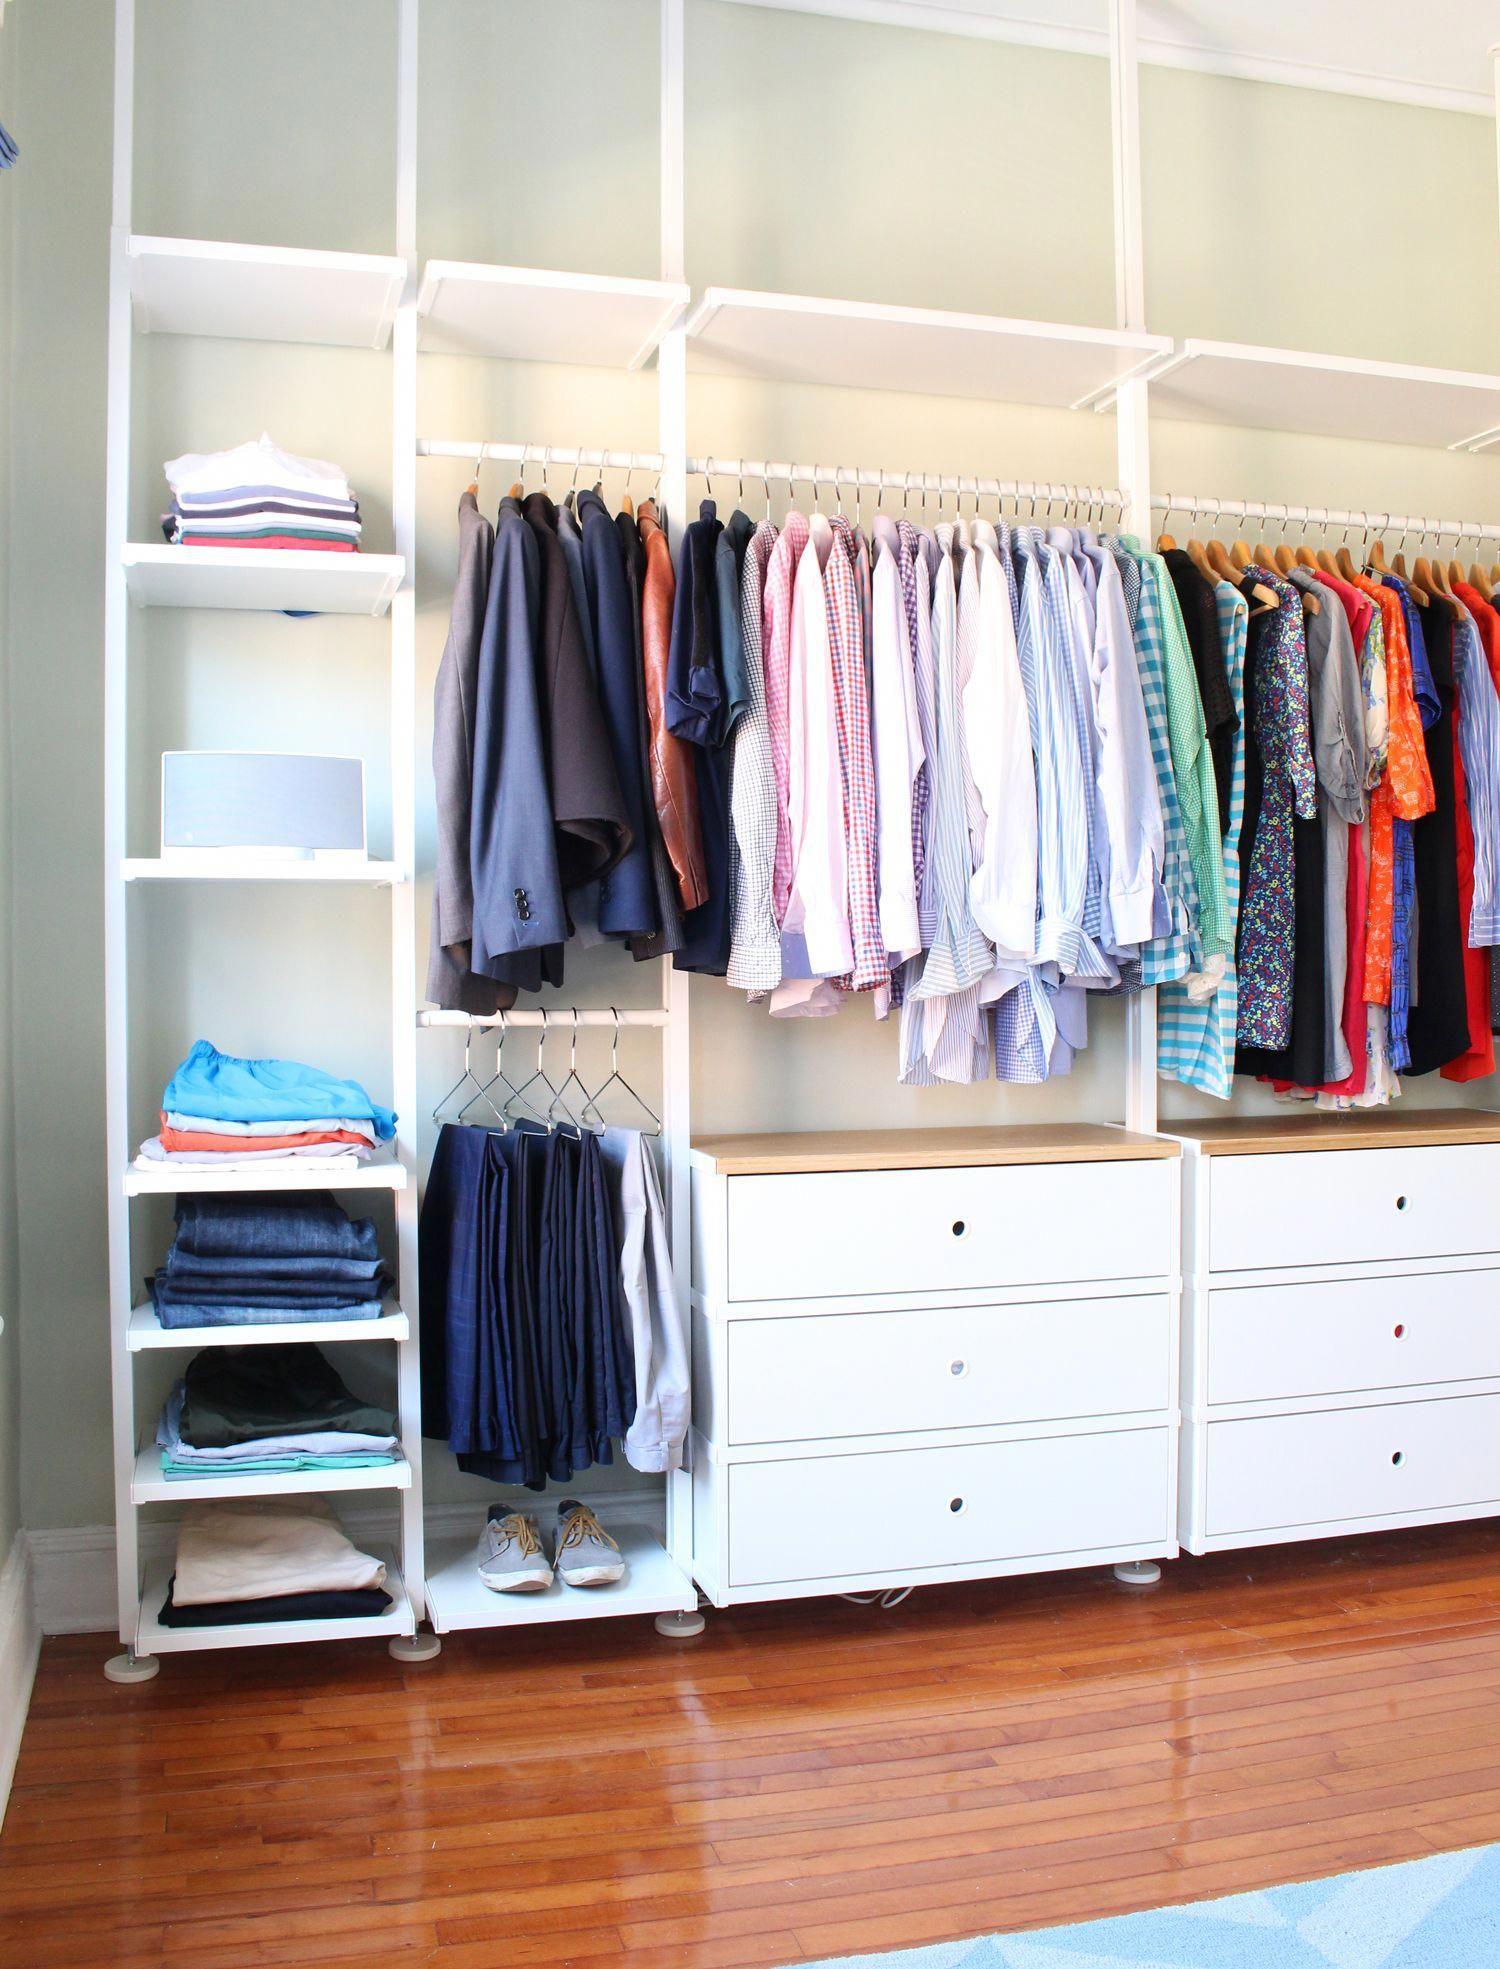 Ikea Has Several Custom Closet Organization Systems Including The